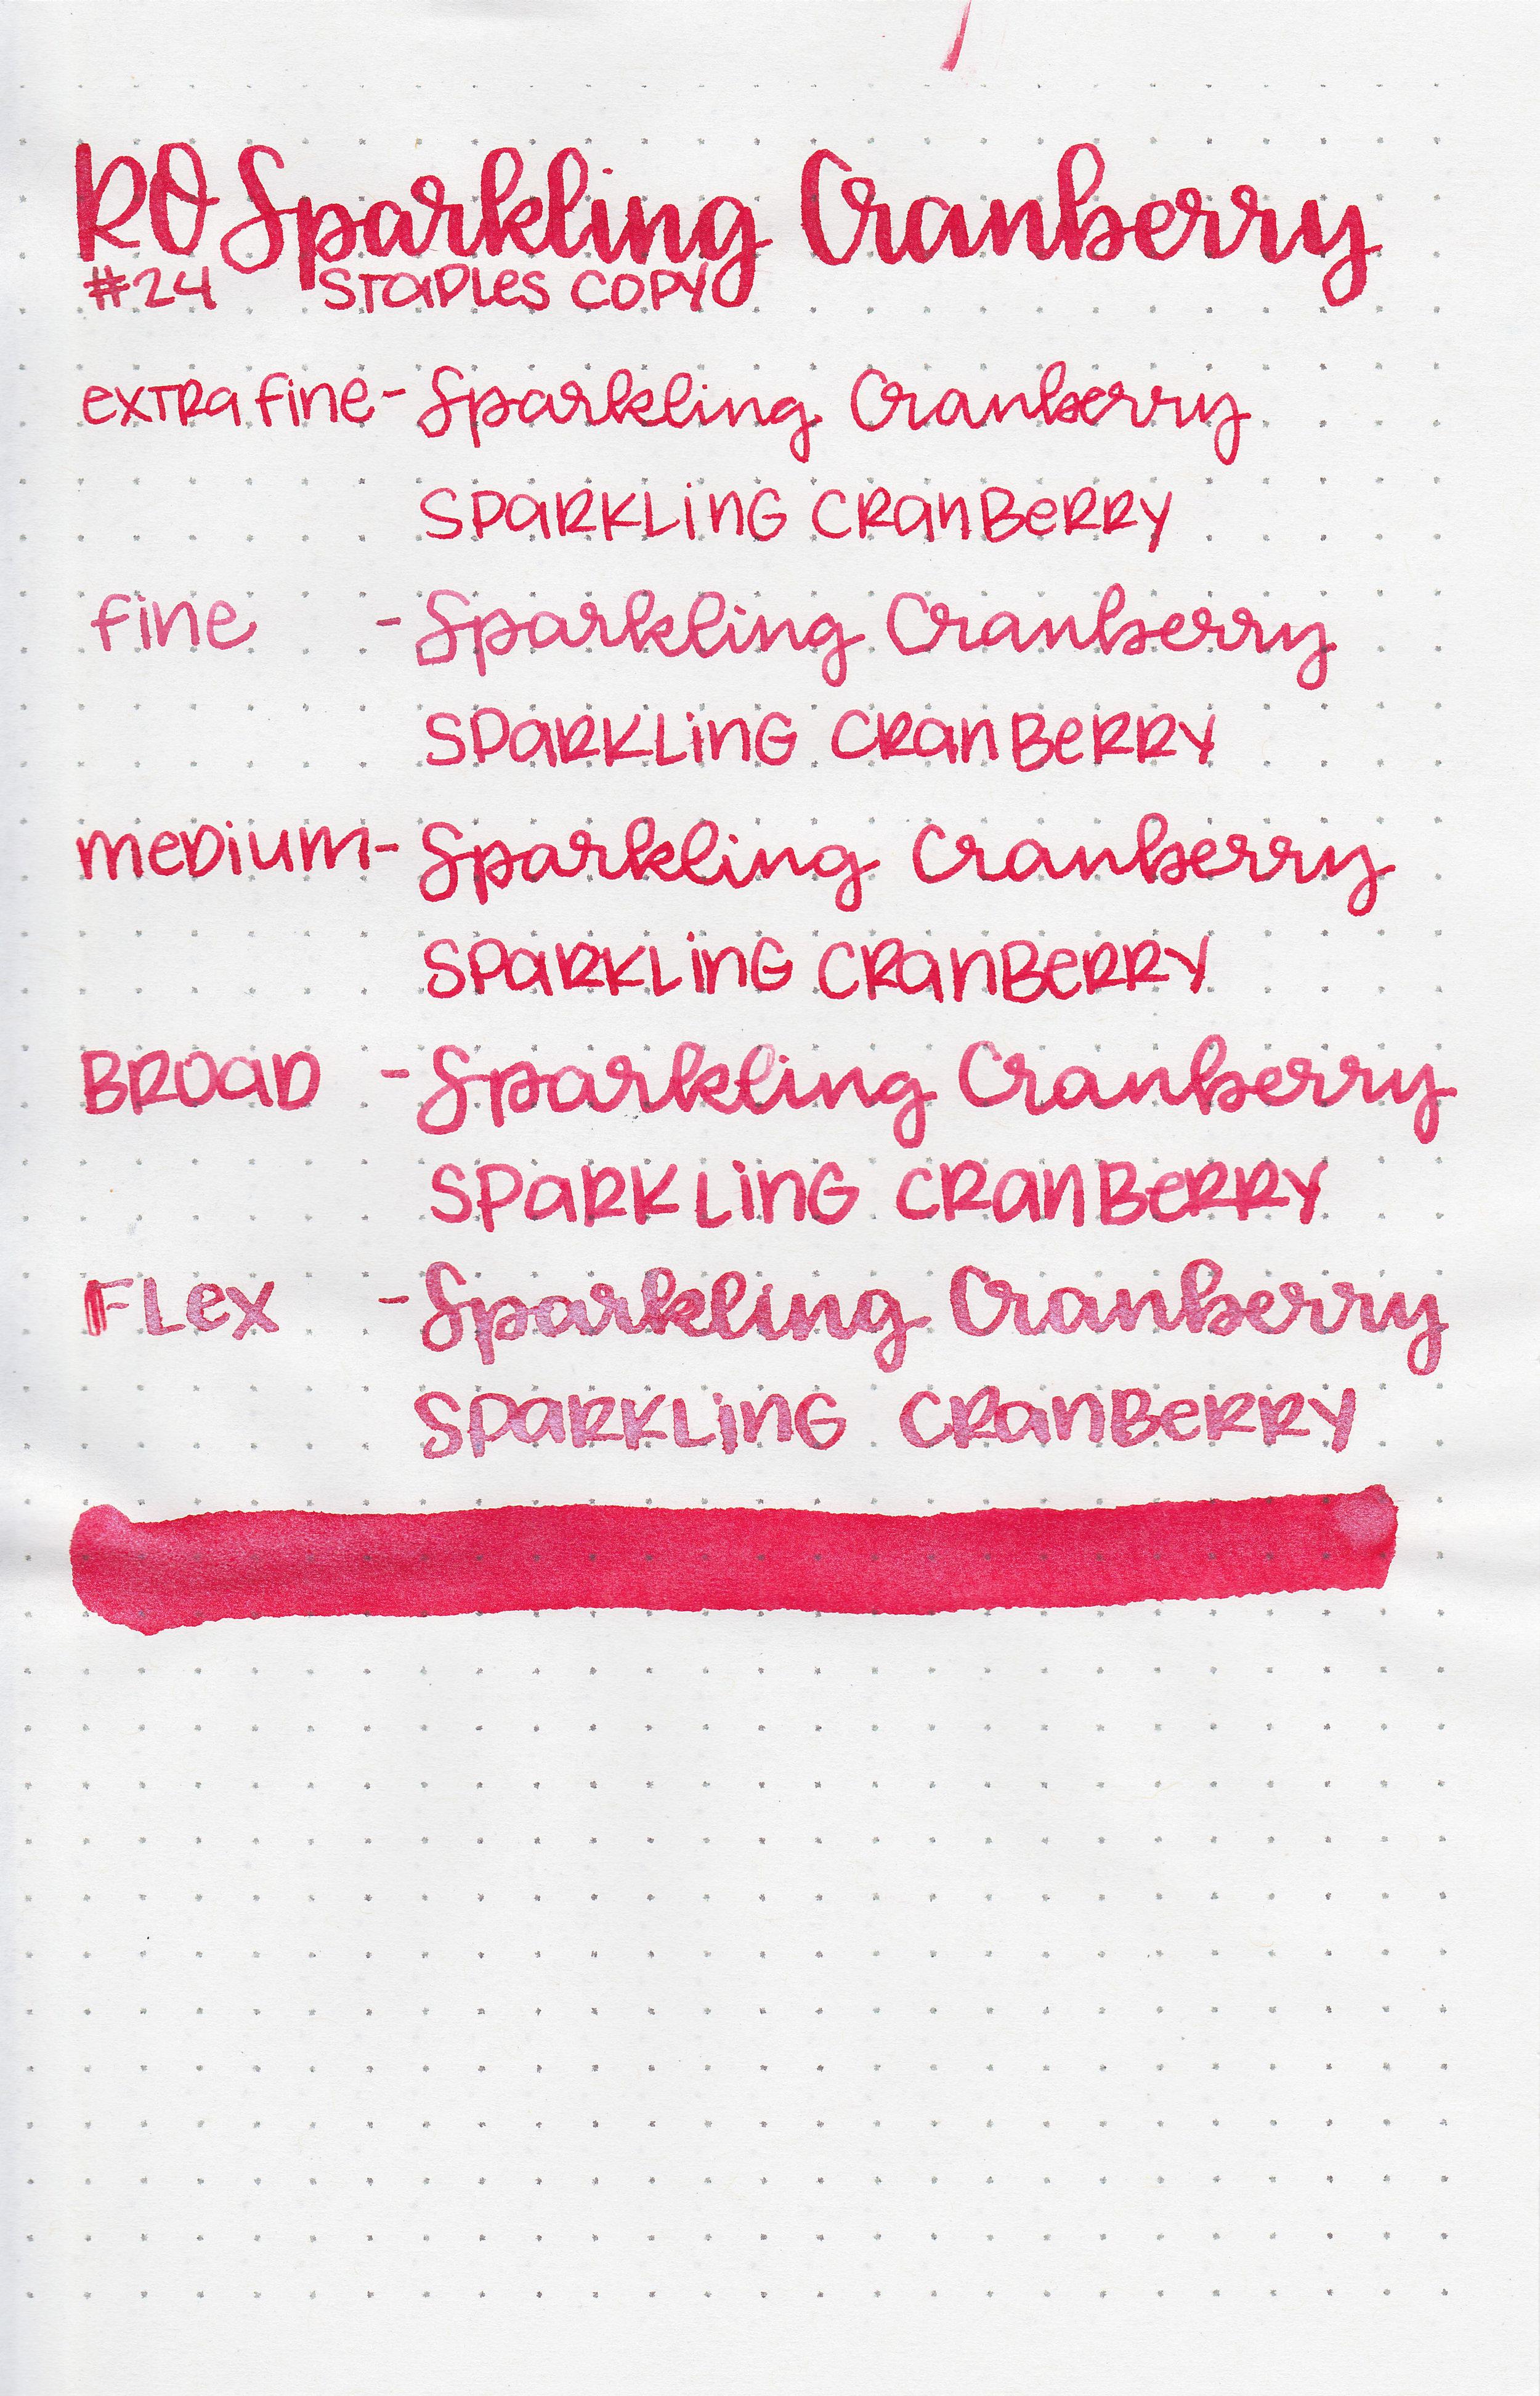 ro-sparkling-cranberry-10.jpg